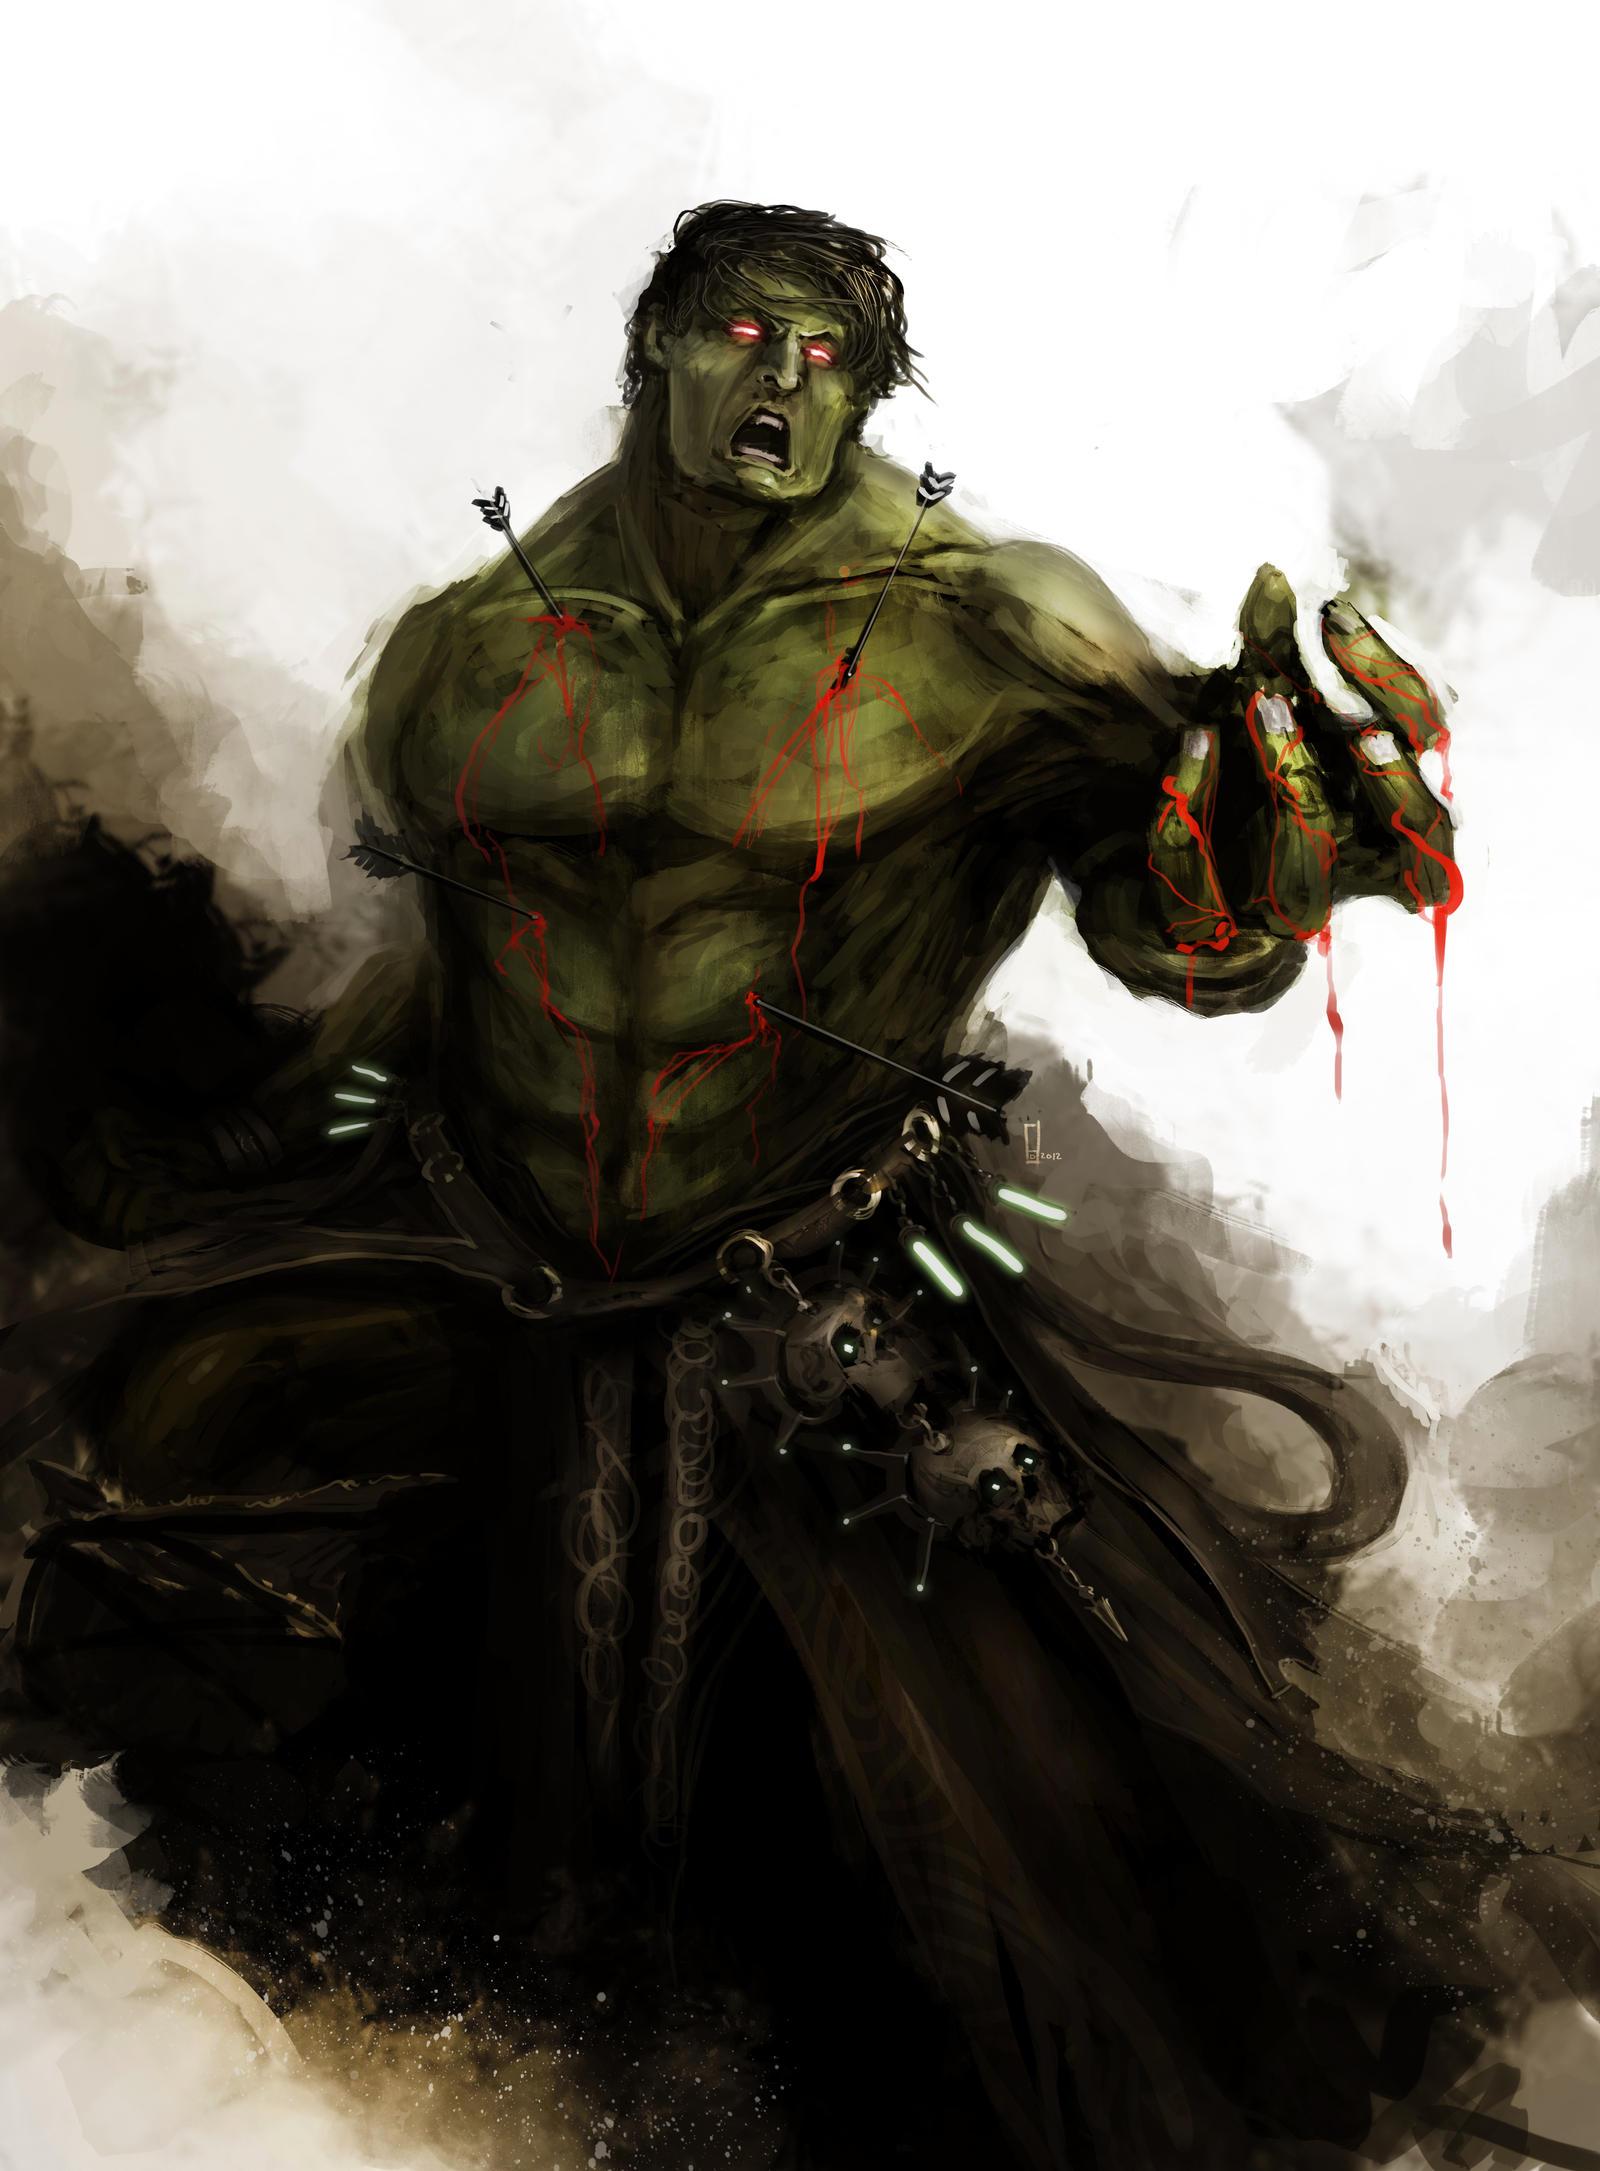 Képek - Page 3 The_avengers___hulk_by_thedurrrrian-d53tnk5